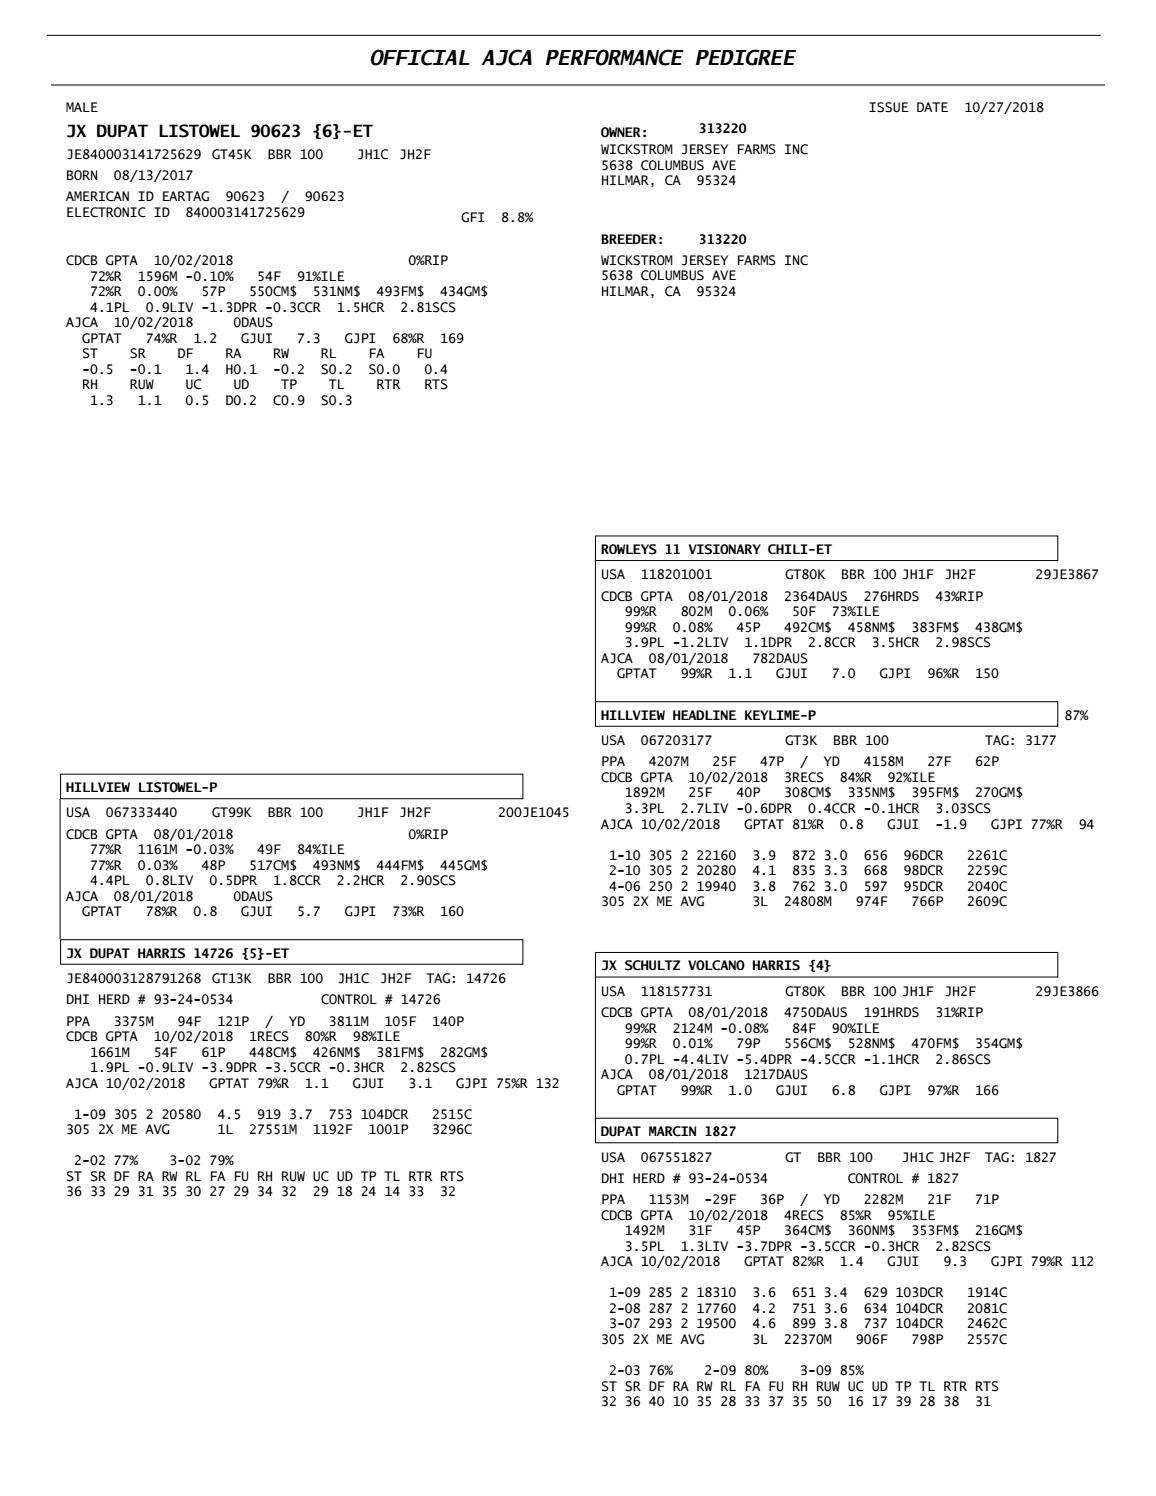 WICKSTROM JERSEY FARMS - BULLS by TURLOCK LIVESTOCK AUCTION YARD - issuu